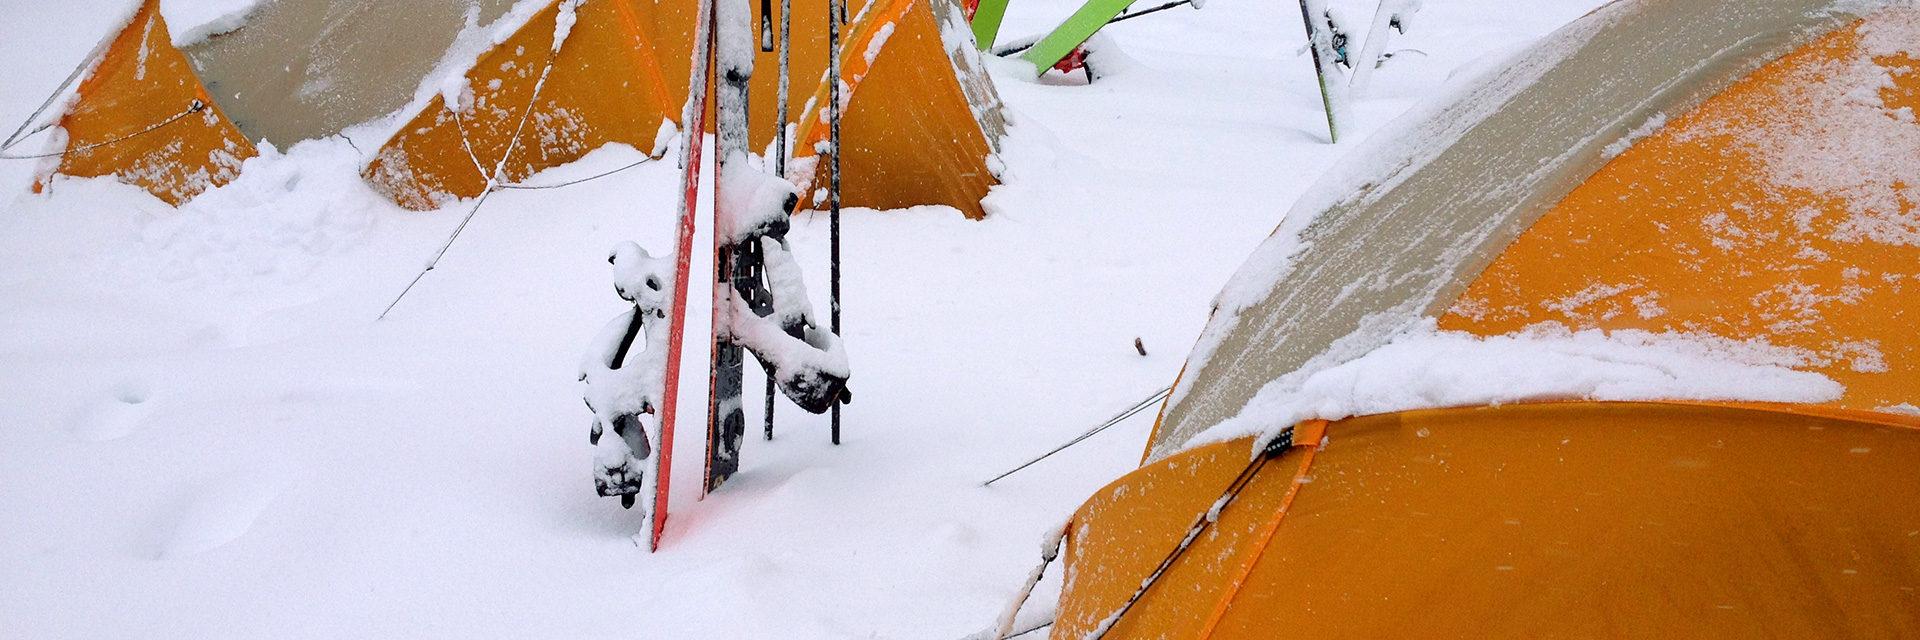 Wintercamping in Norway